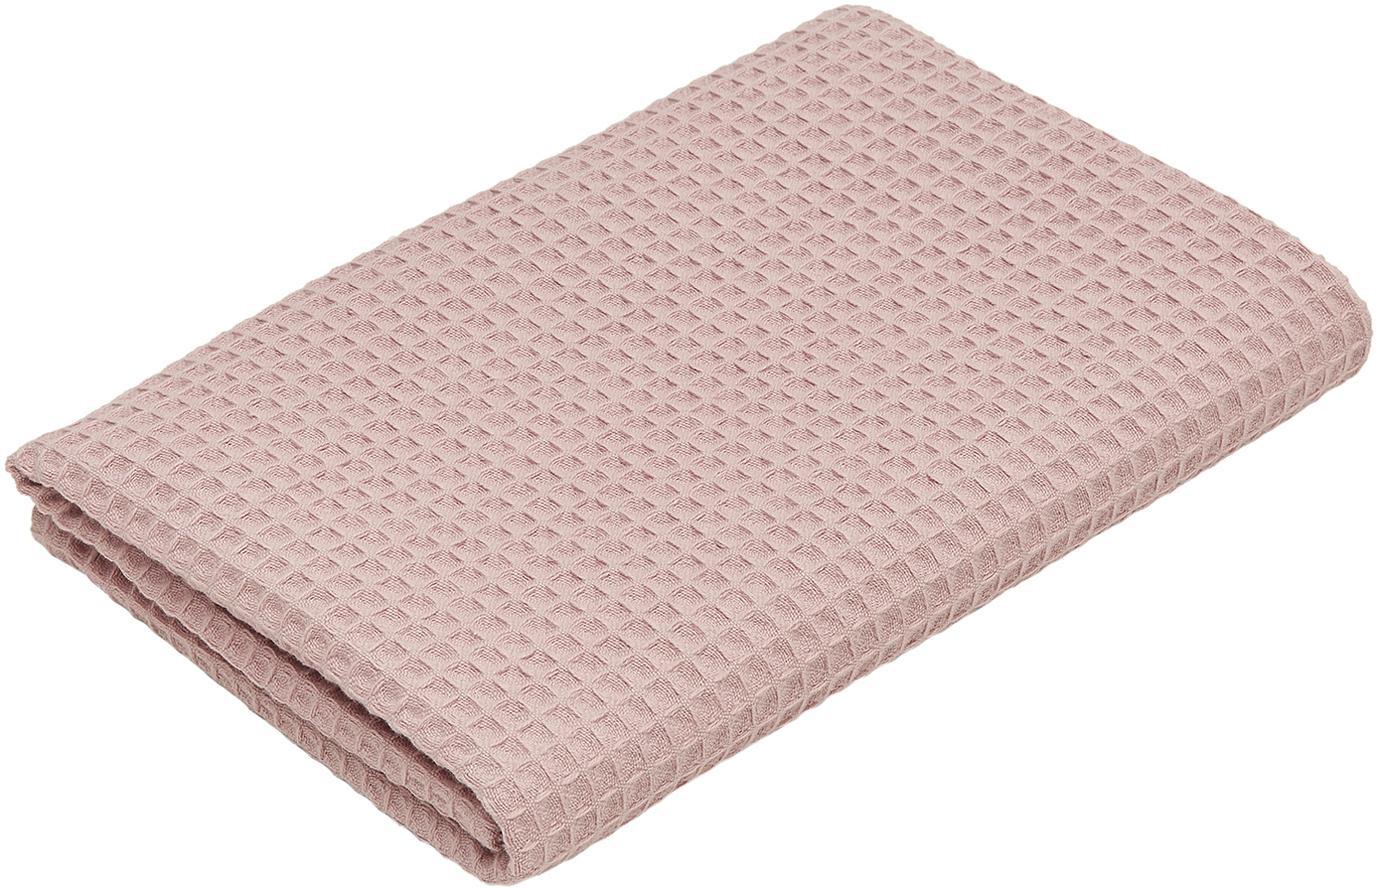 Leichtes Waffelpiqué-Handtuch Karima, verschiedene Größen, Altrosa, Duschtuch